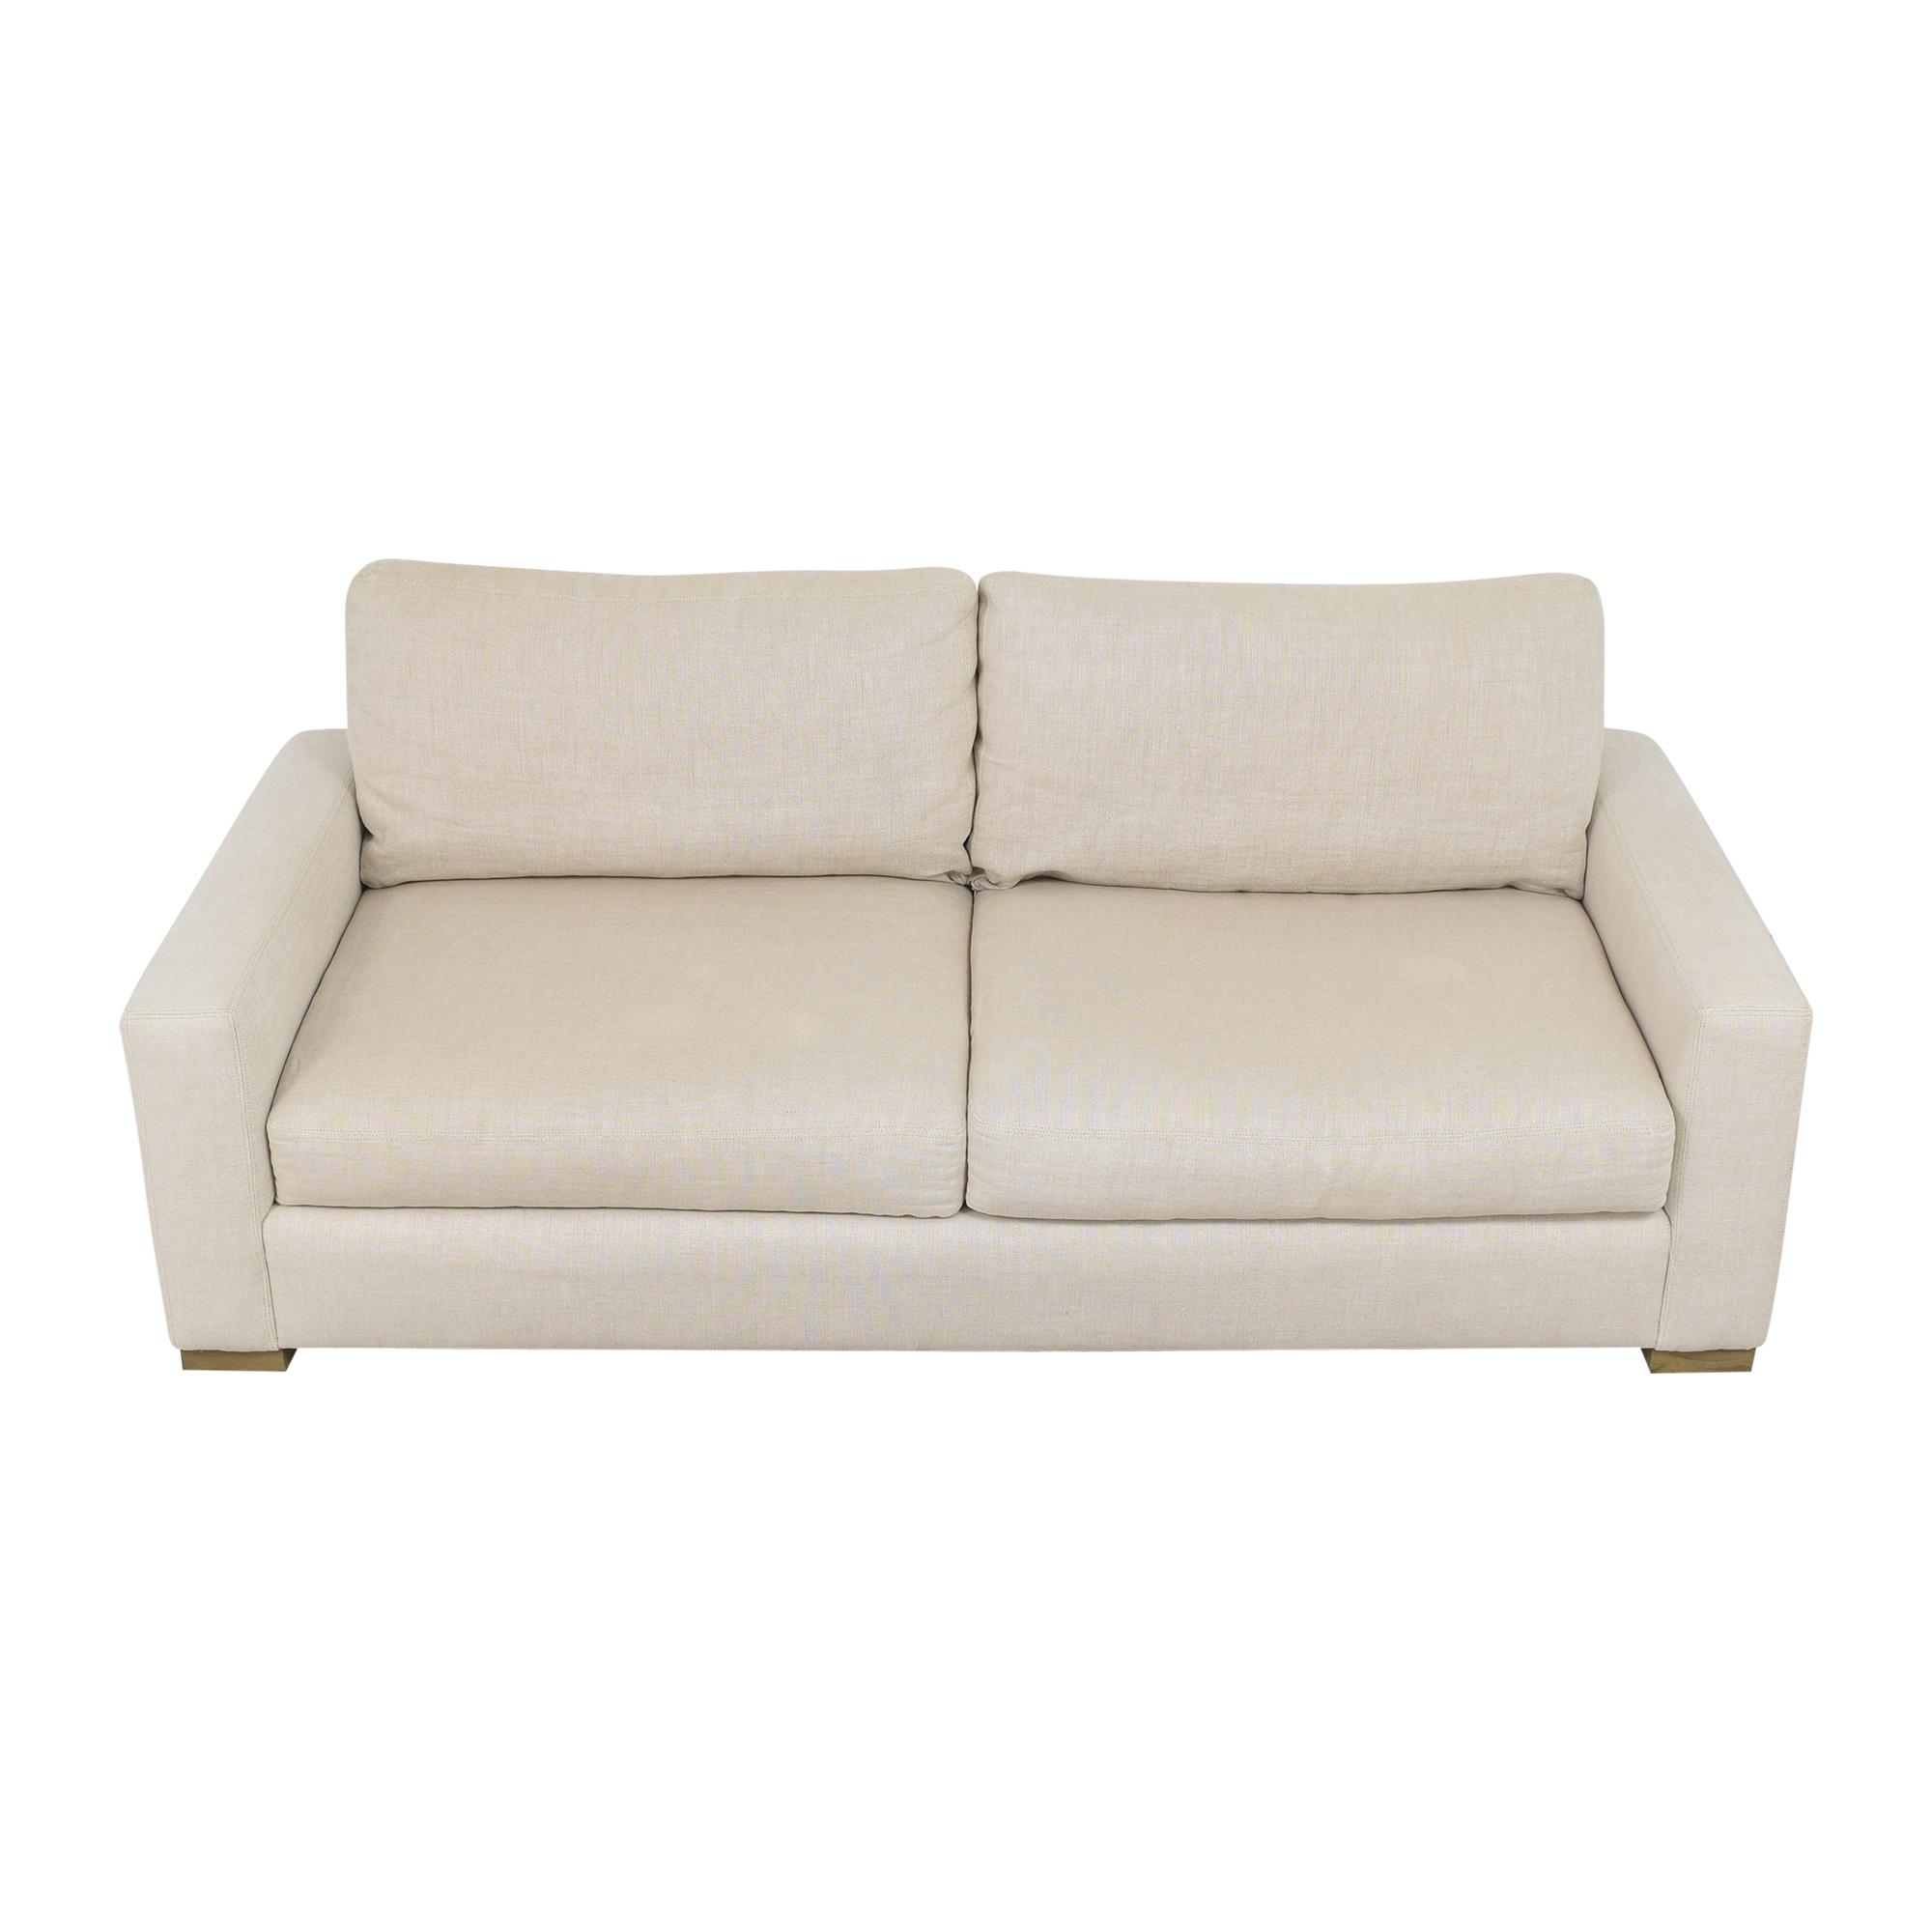 Restoration Hardware Restoration Hardware Two Cushion Sofa discount